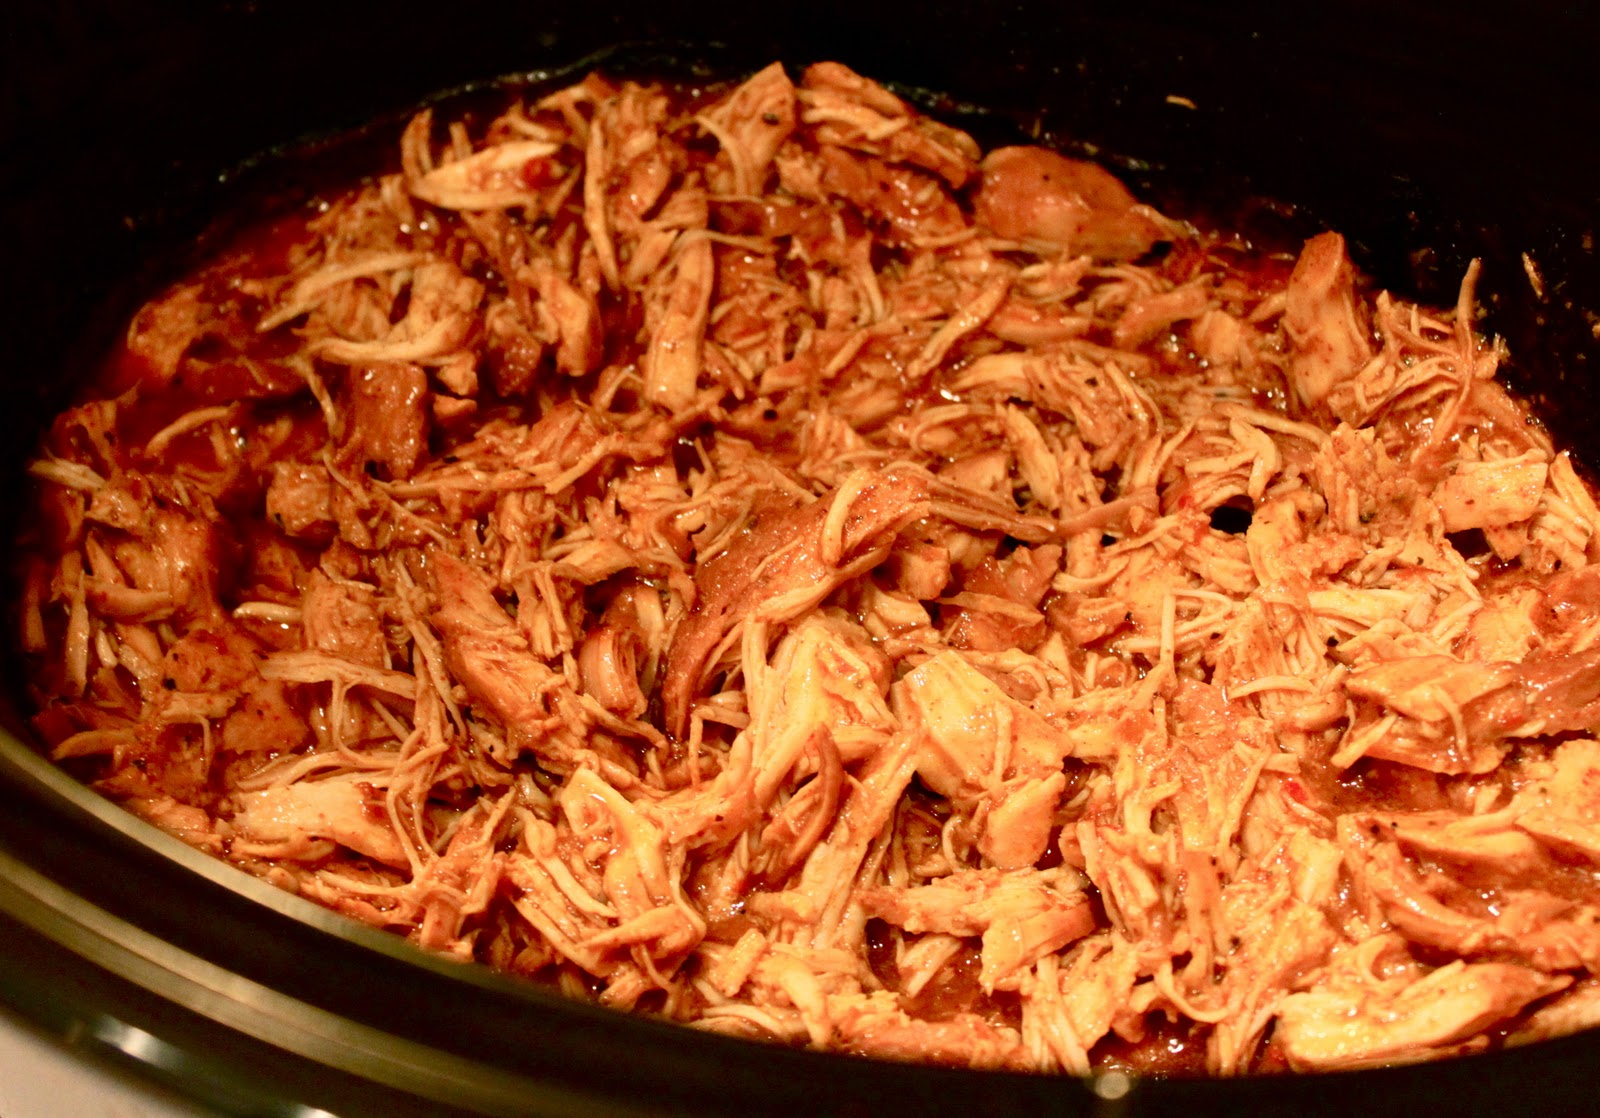 Cafe Rio Shredded Chicken Nutrition